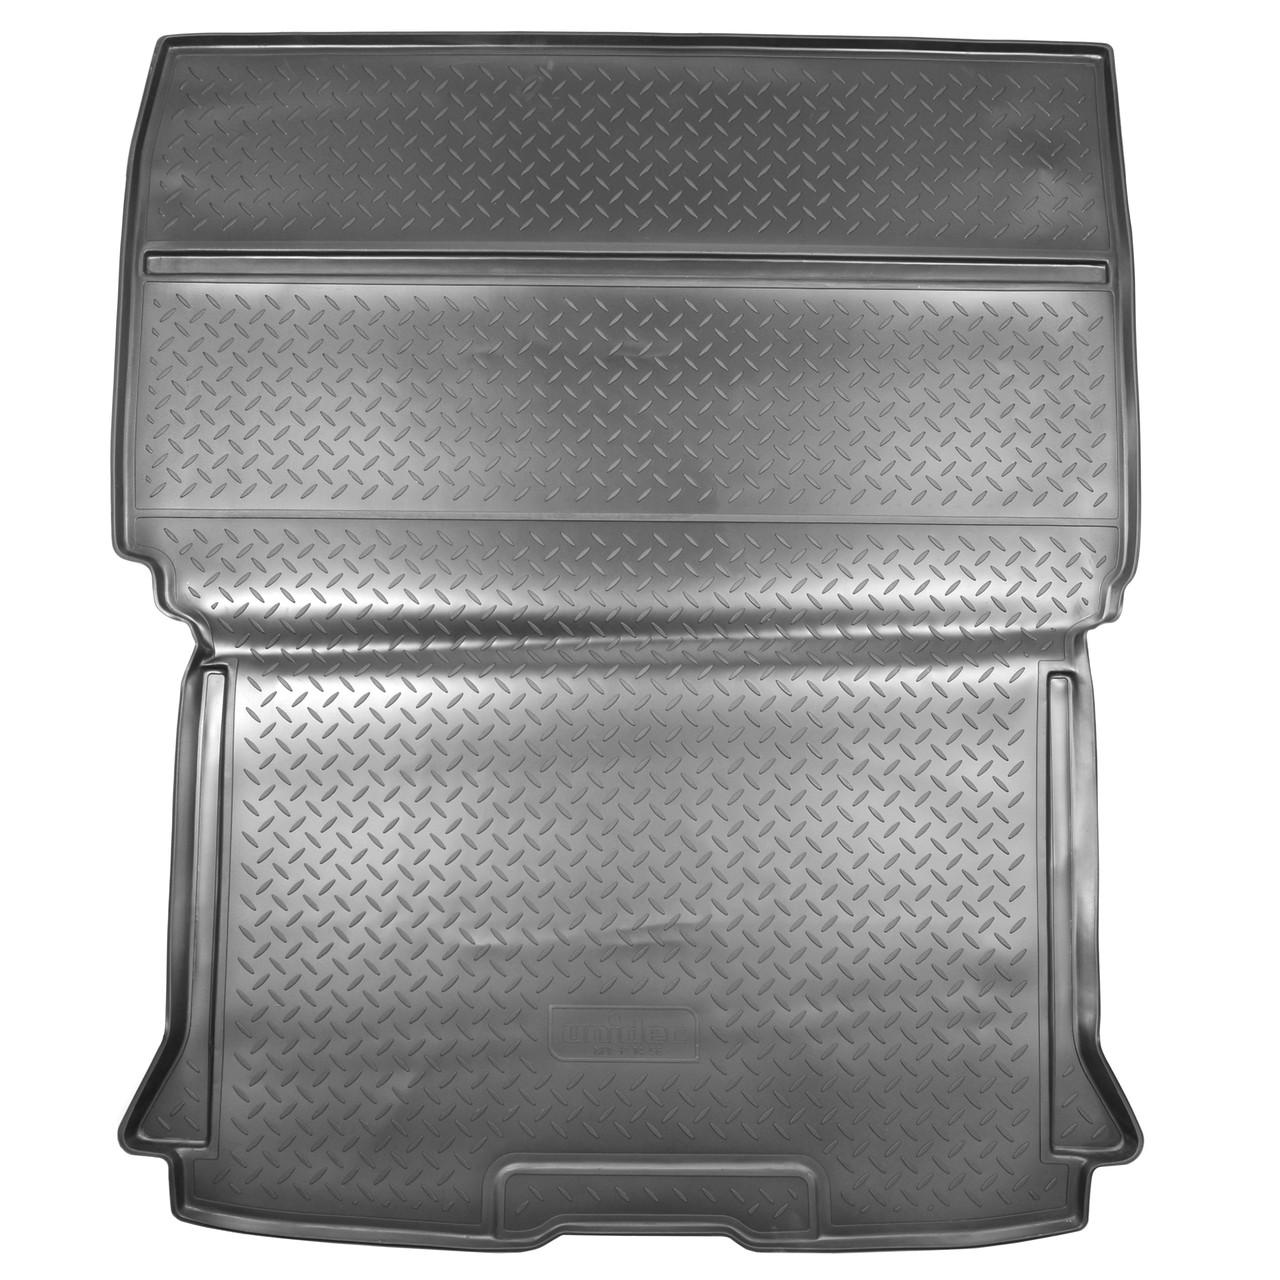 Коврик в багажник Citroen Berlingo (MF) (1996) (фургон)\ Peugeot Partner (M49/M59) (1997) (фургон)